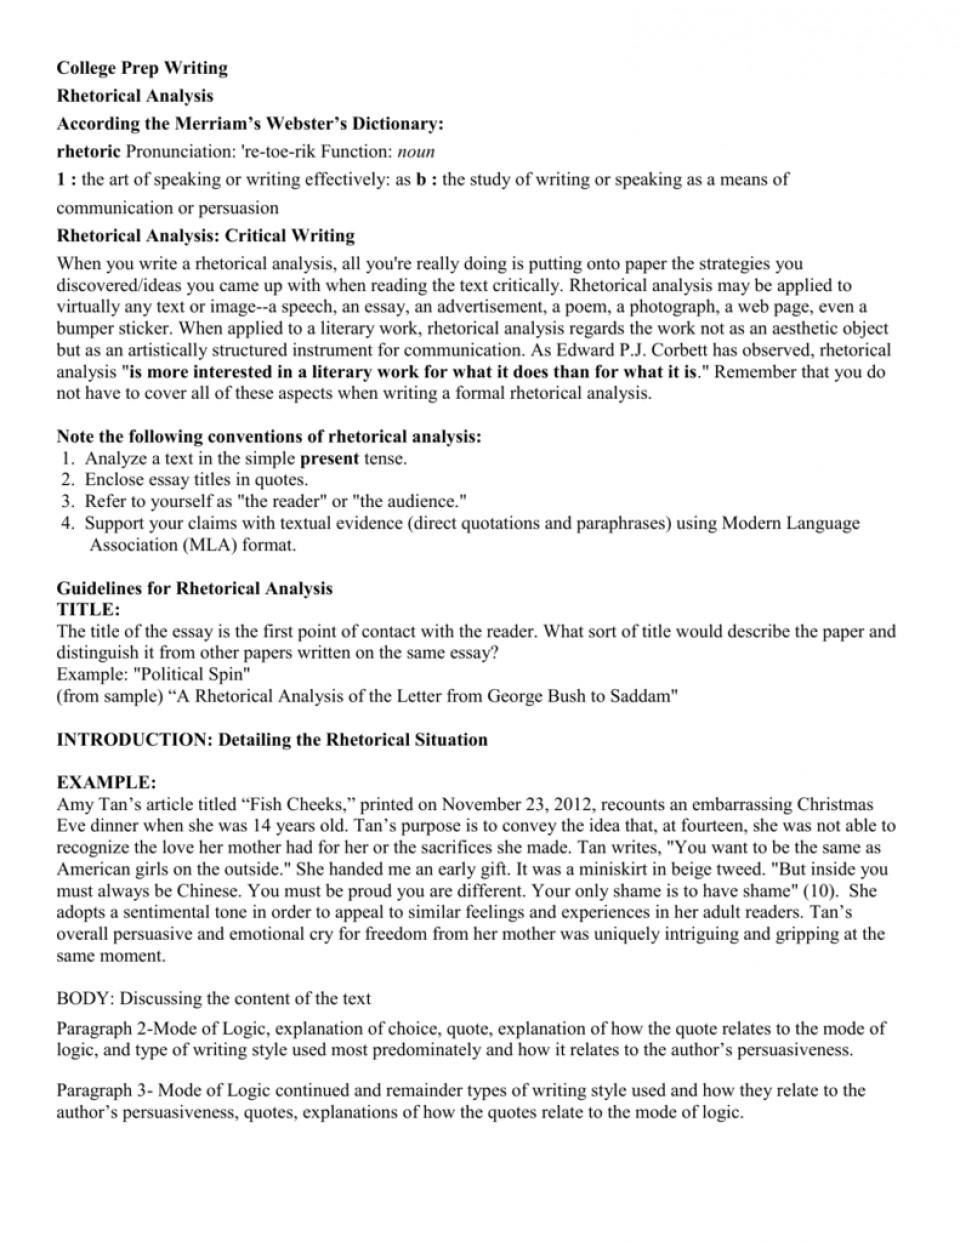 007 simple present tense writing creative tasks 100285 1